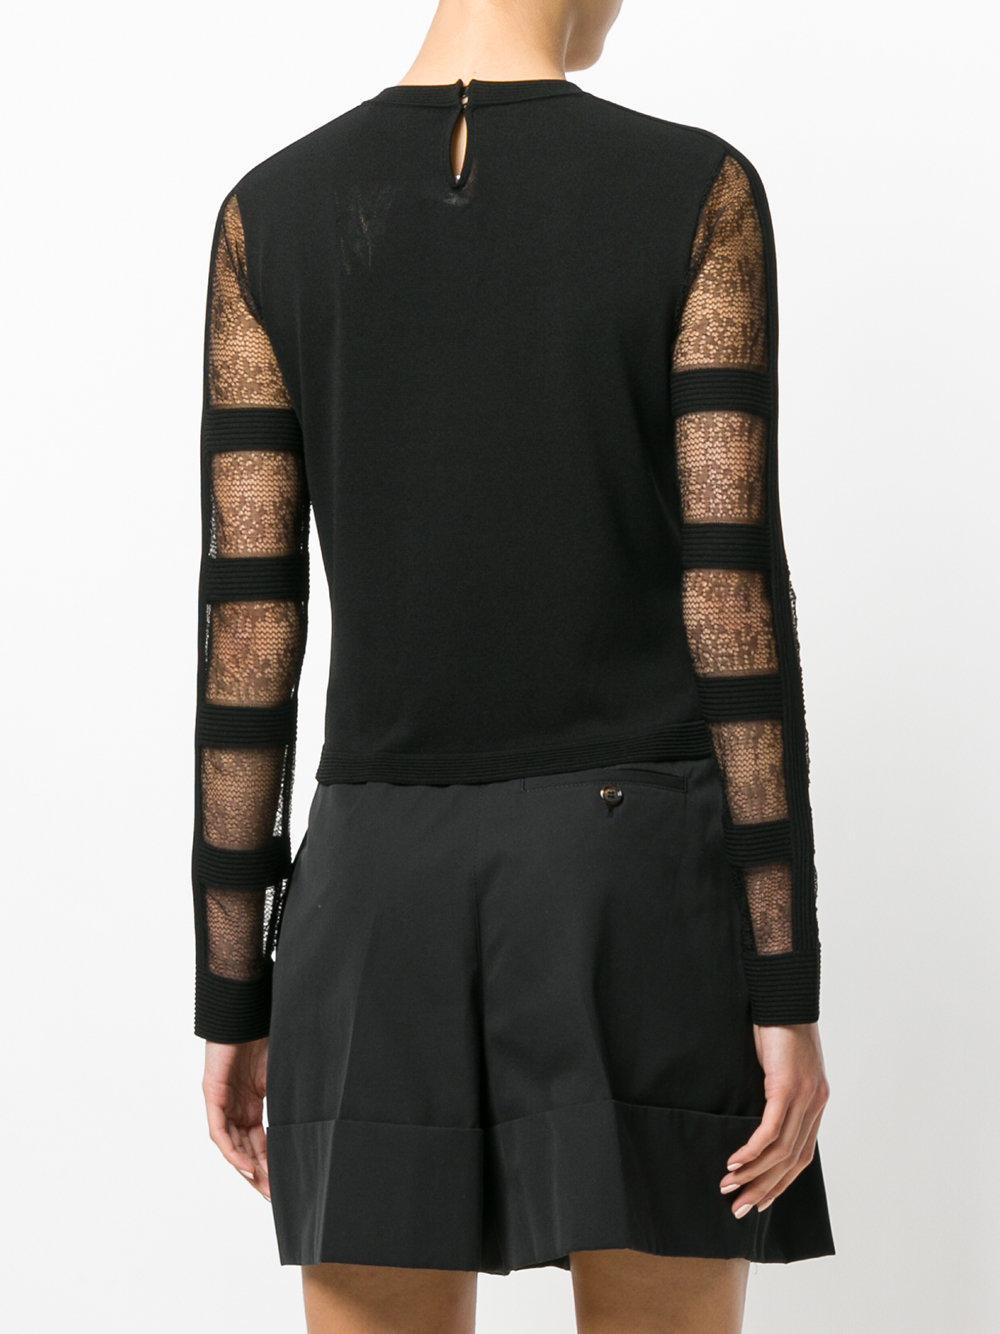 Release Dates Alexander McQueen sheer sleeve blouse Cheap Sale Genuine L2FKl7qF